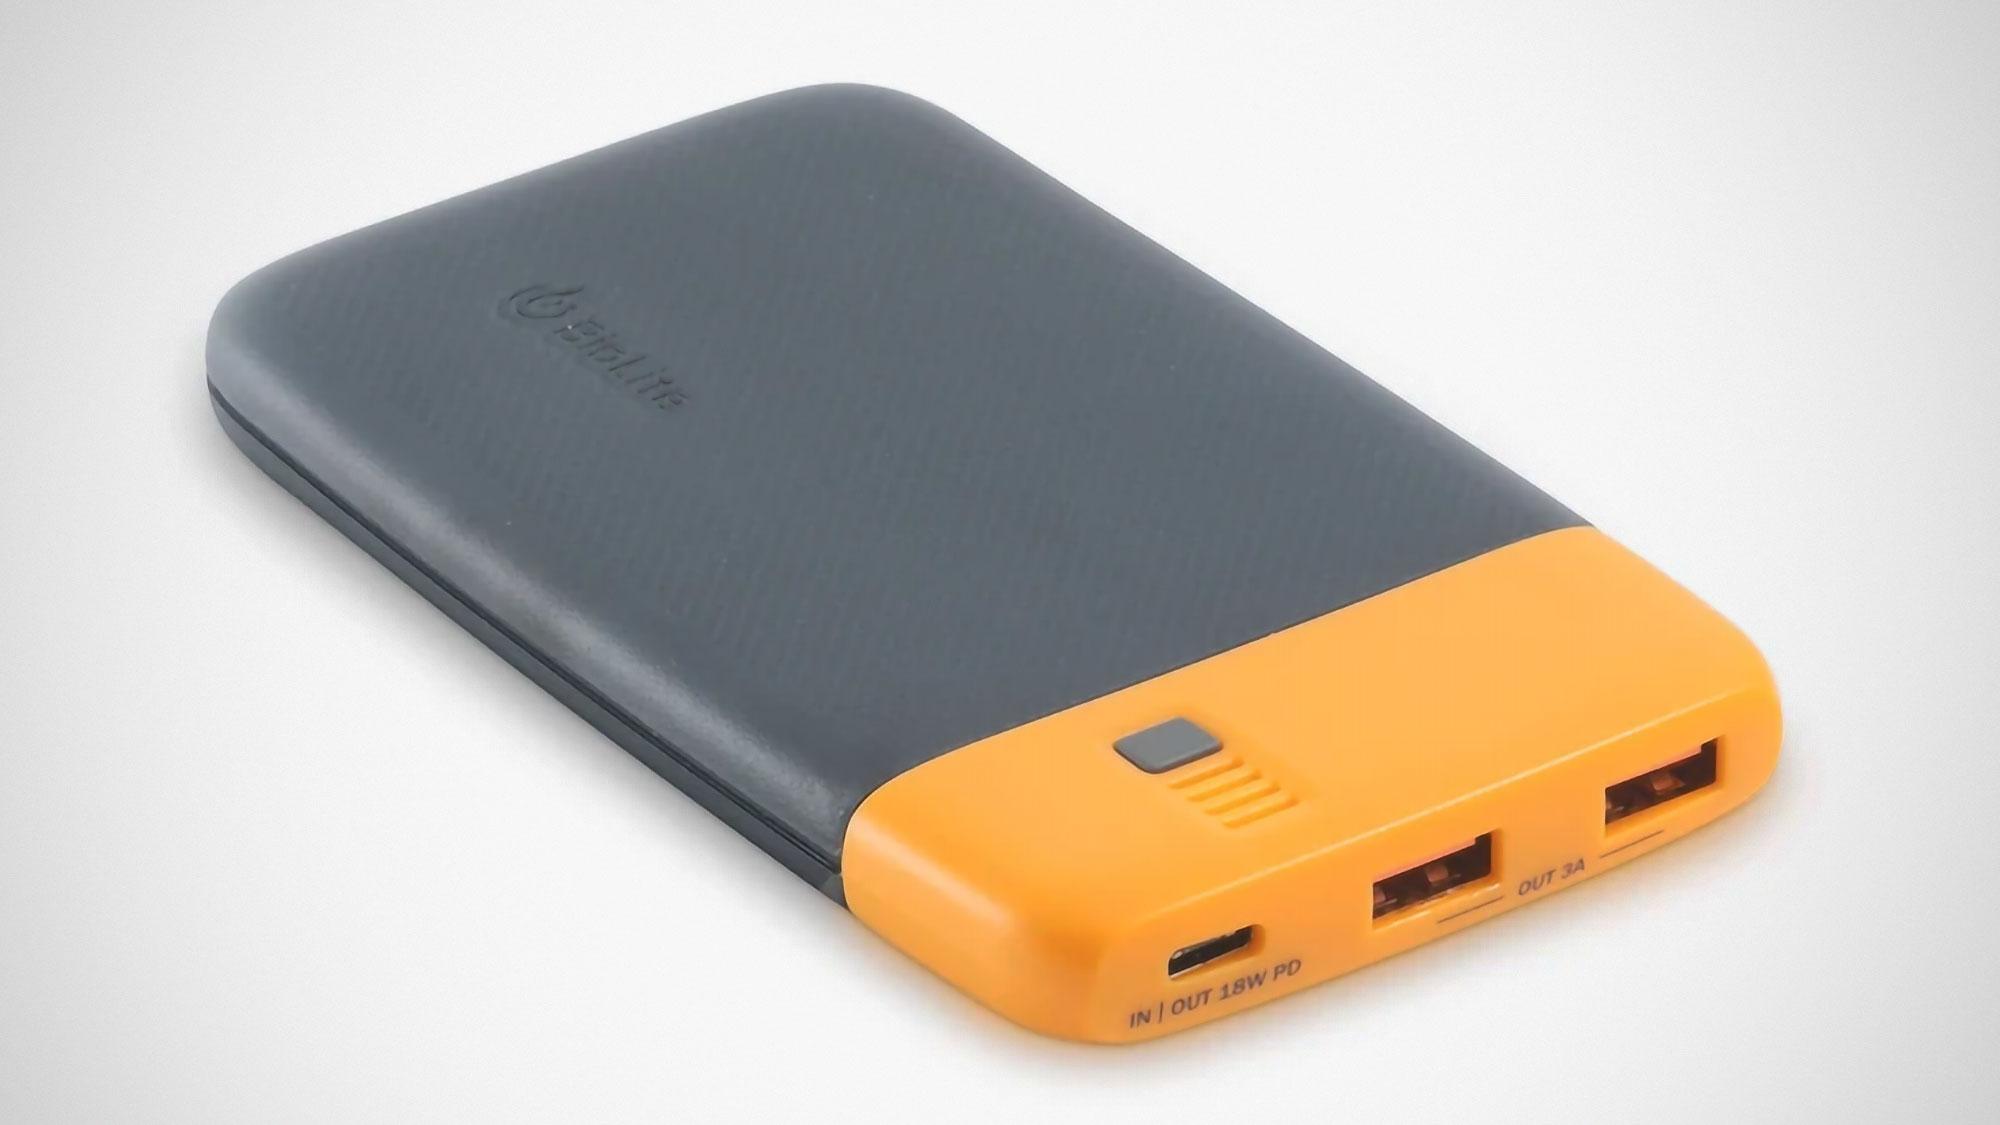 BioLite Charge 20 PD USB-C PD Powerbank